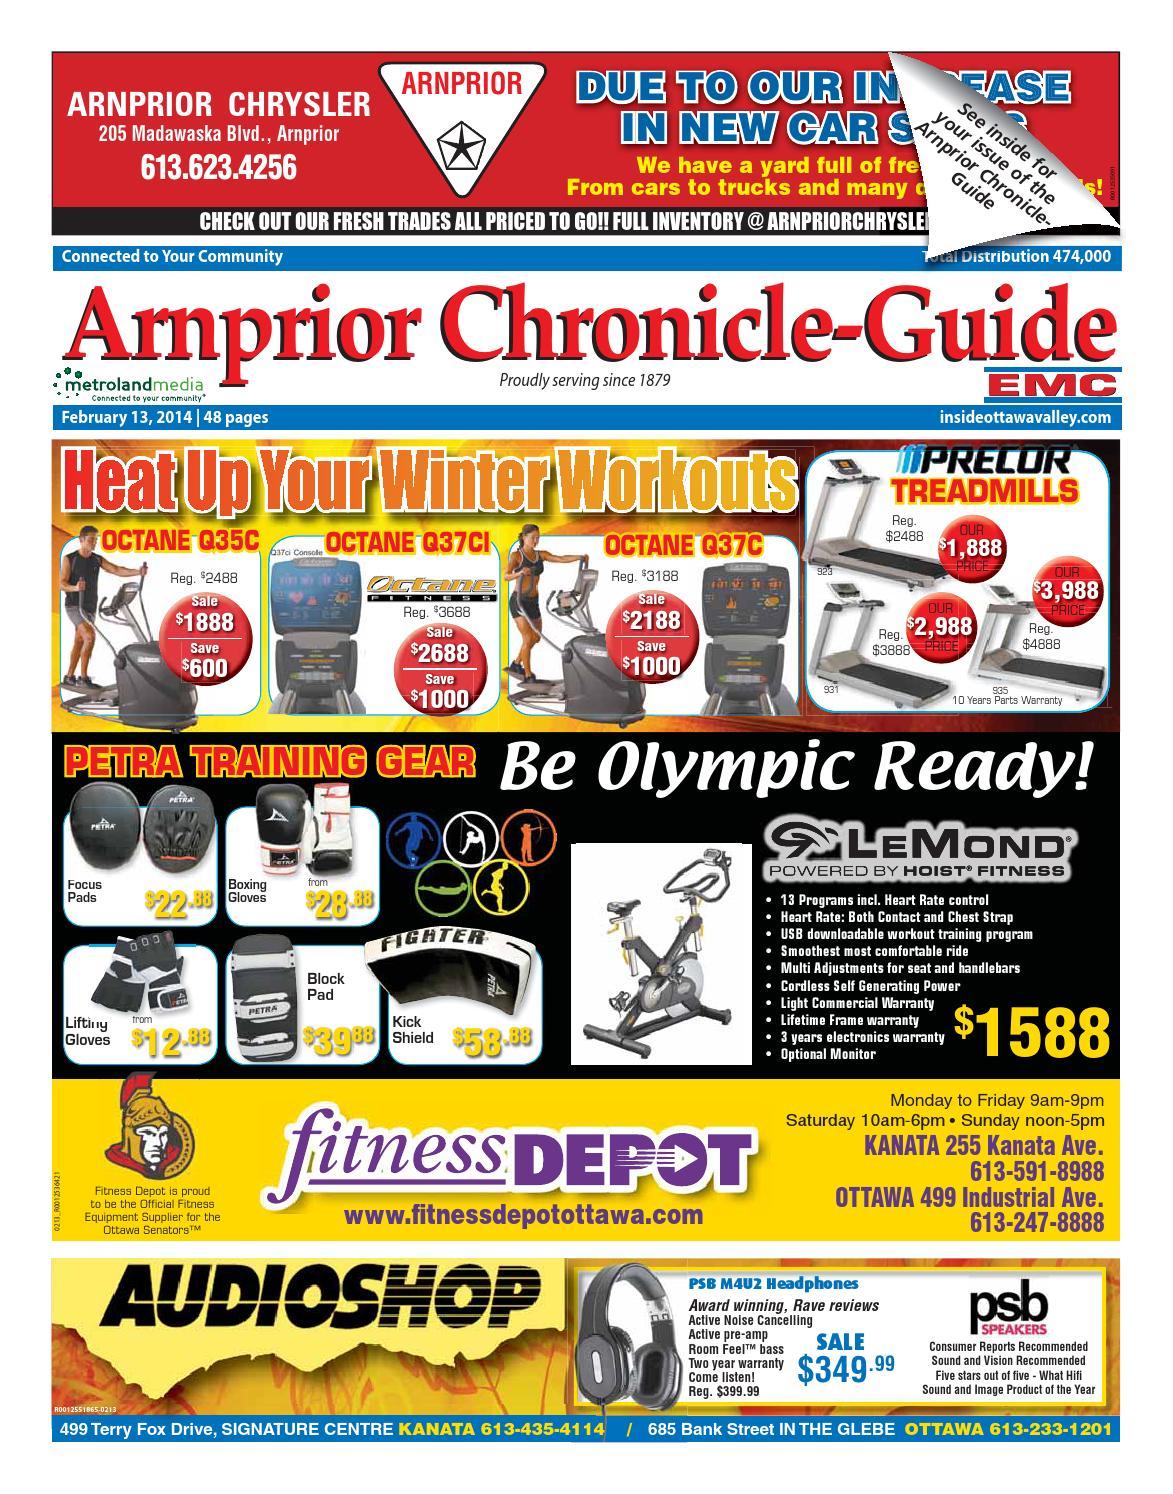 cfdecd09f2ef Arnprior021314 by Metroland East - Arnprior Chronicle-Guide - issuu